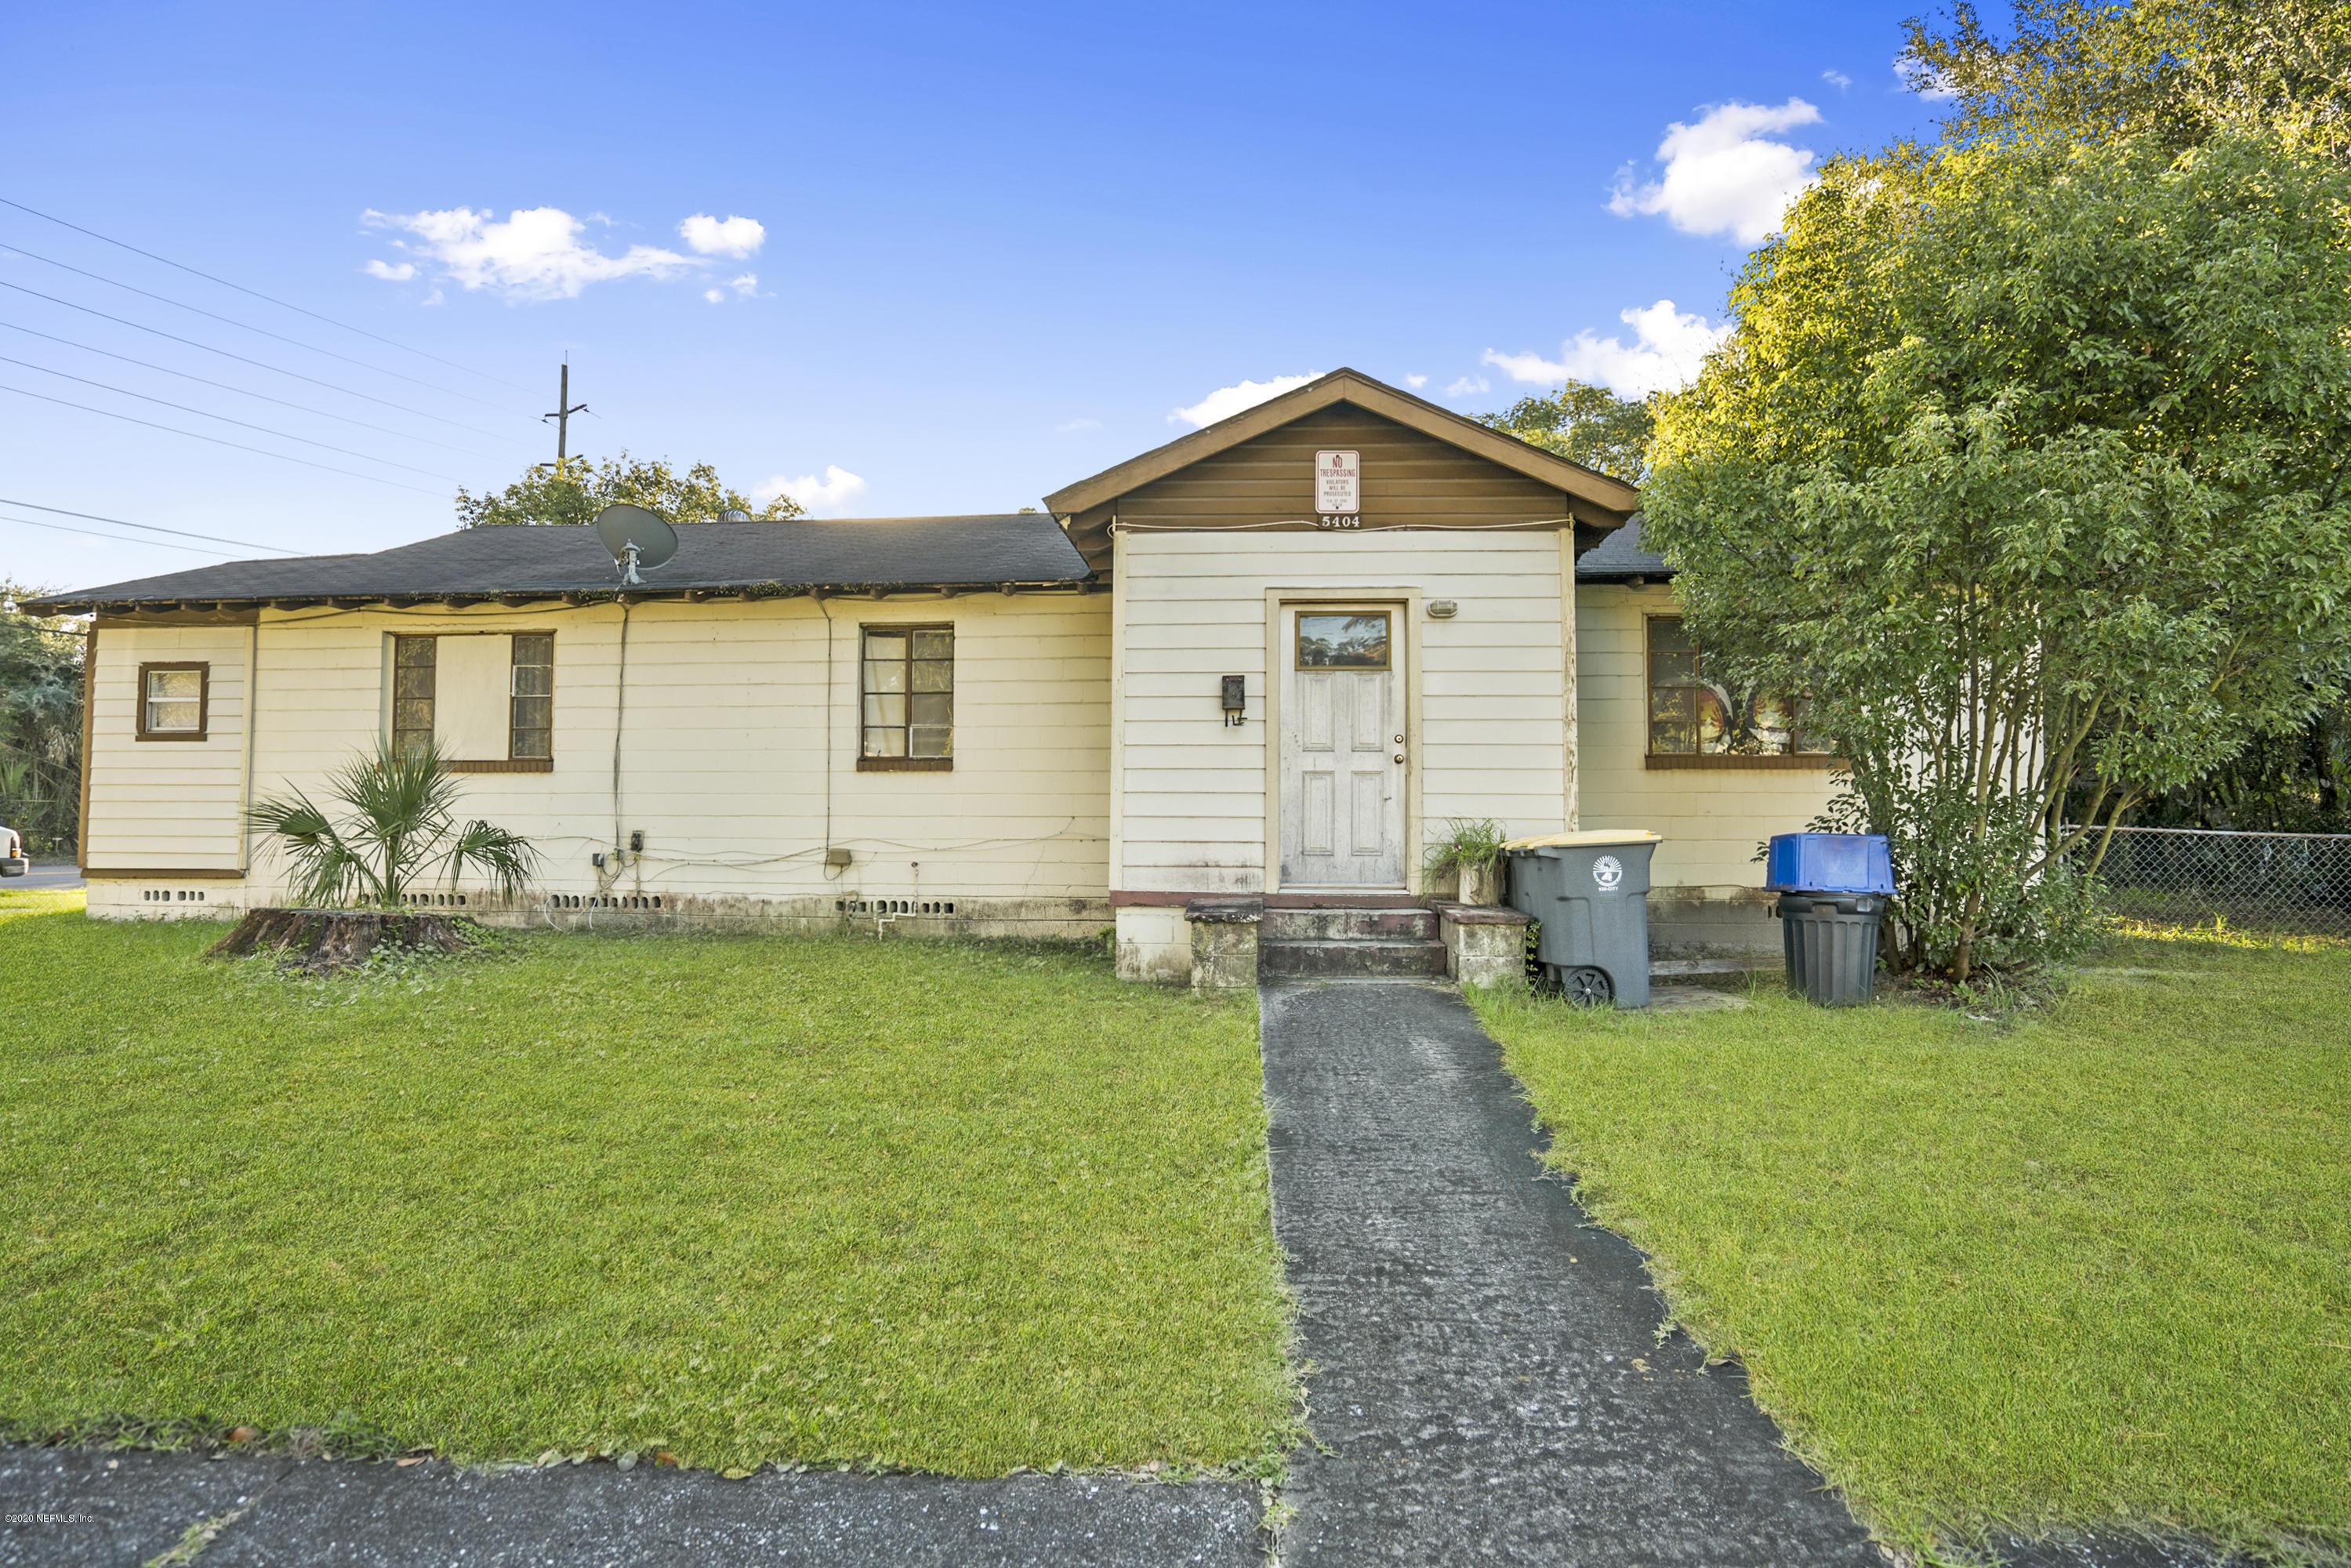 5404 TELFAIR, JACKSONVILLE, FLORIDA 32208, 9 Bedrooms Bedrooms, ,5 BathroomsBathrooms,Investment / MultiFamily,For sale,TELFAIR,1085325